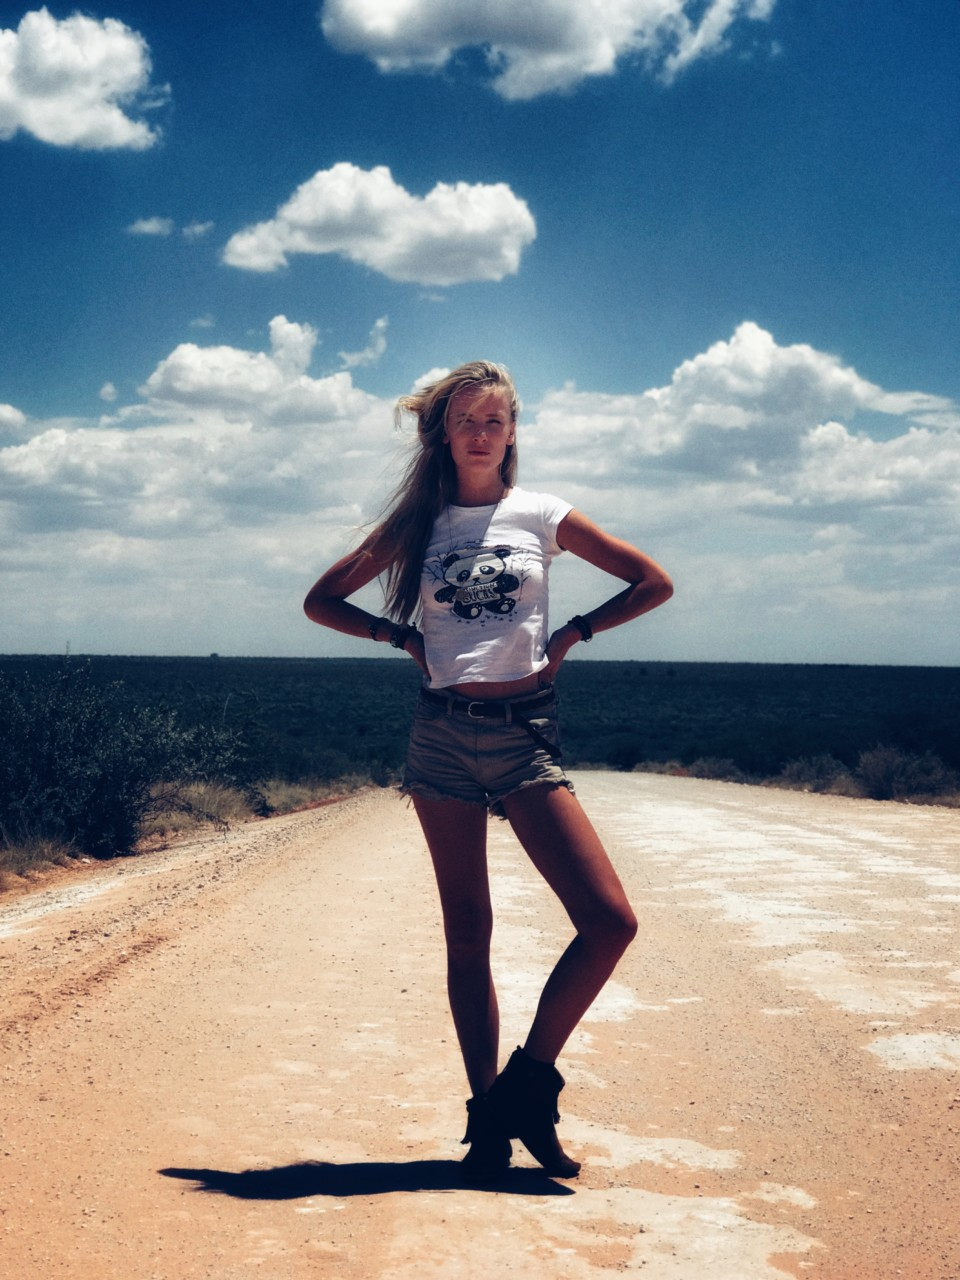 road-to-bushman-land-aleksandra-orbeck-nilsen-namibia